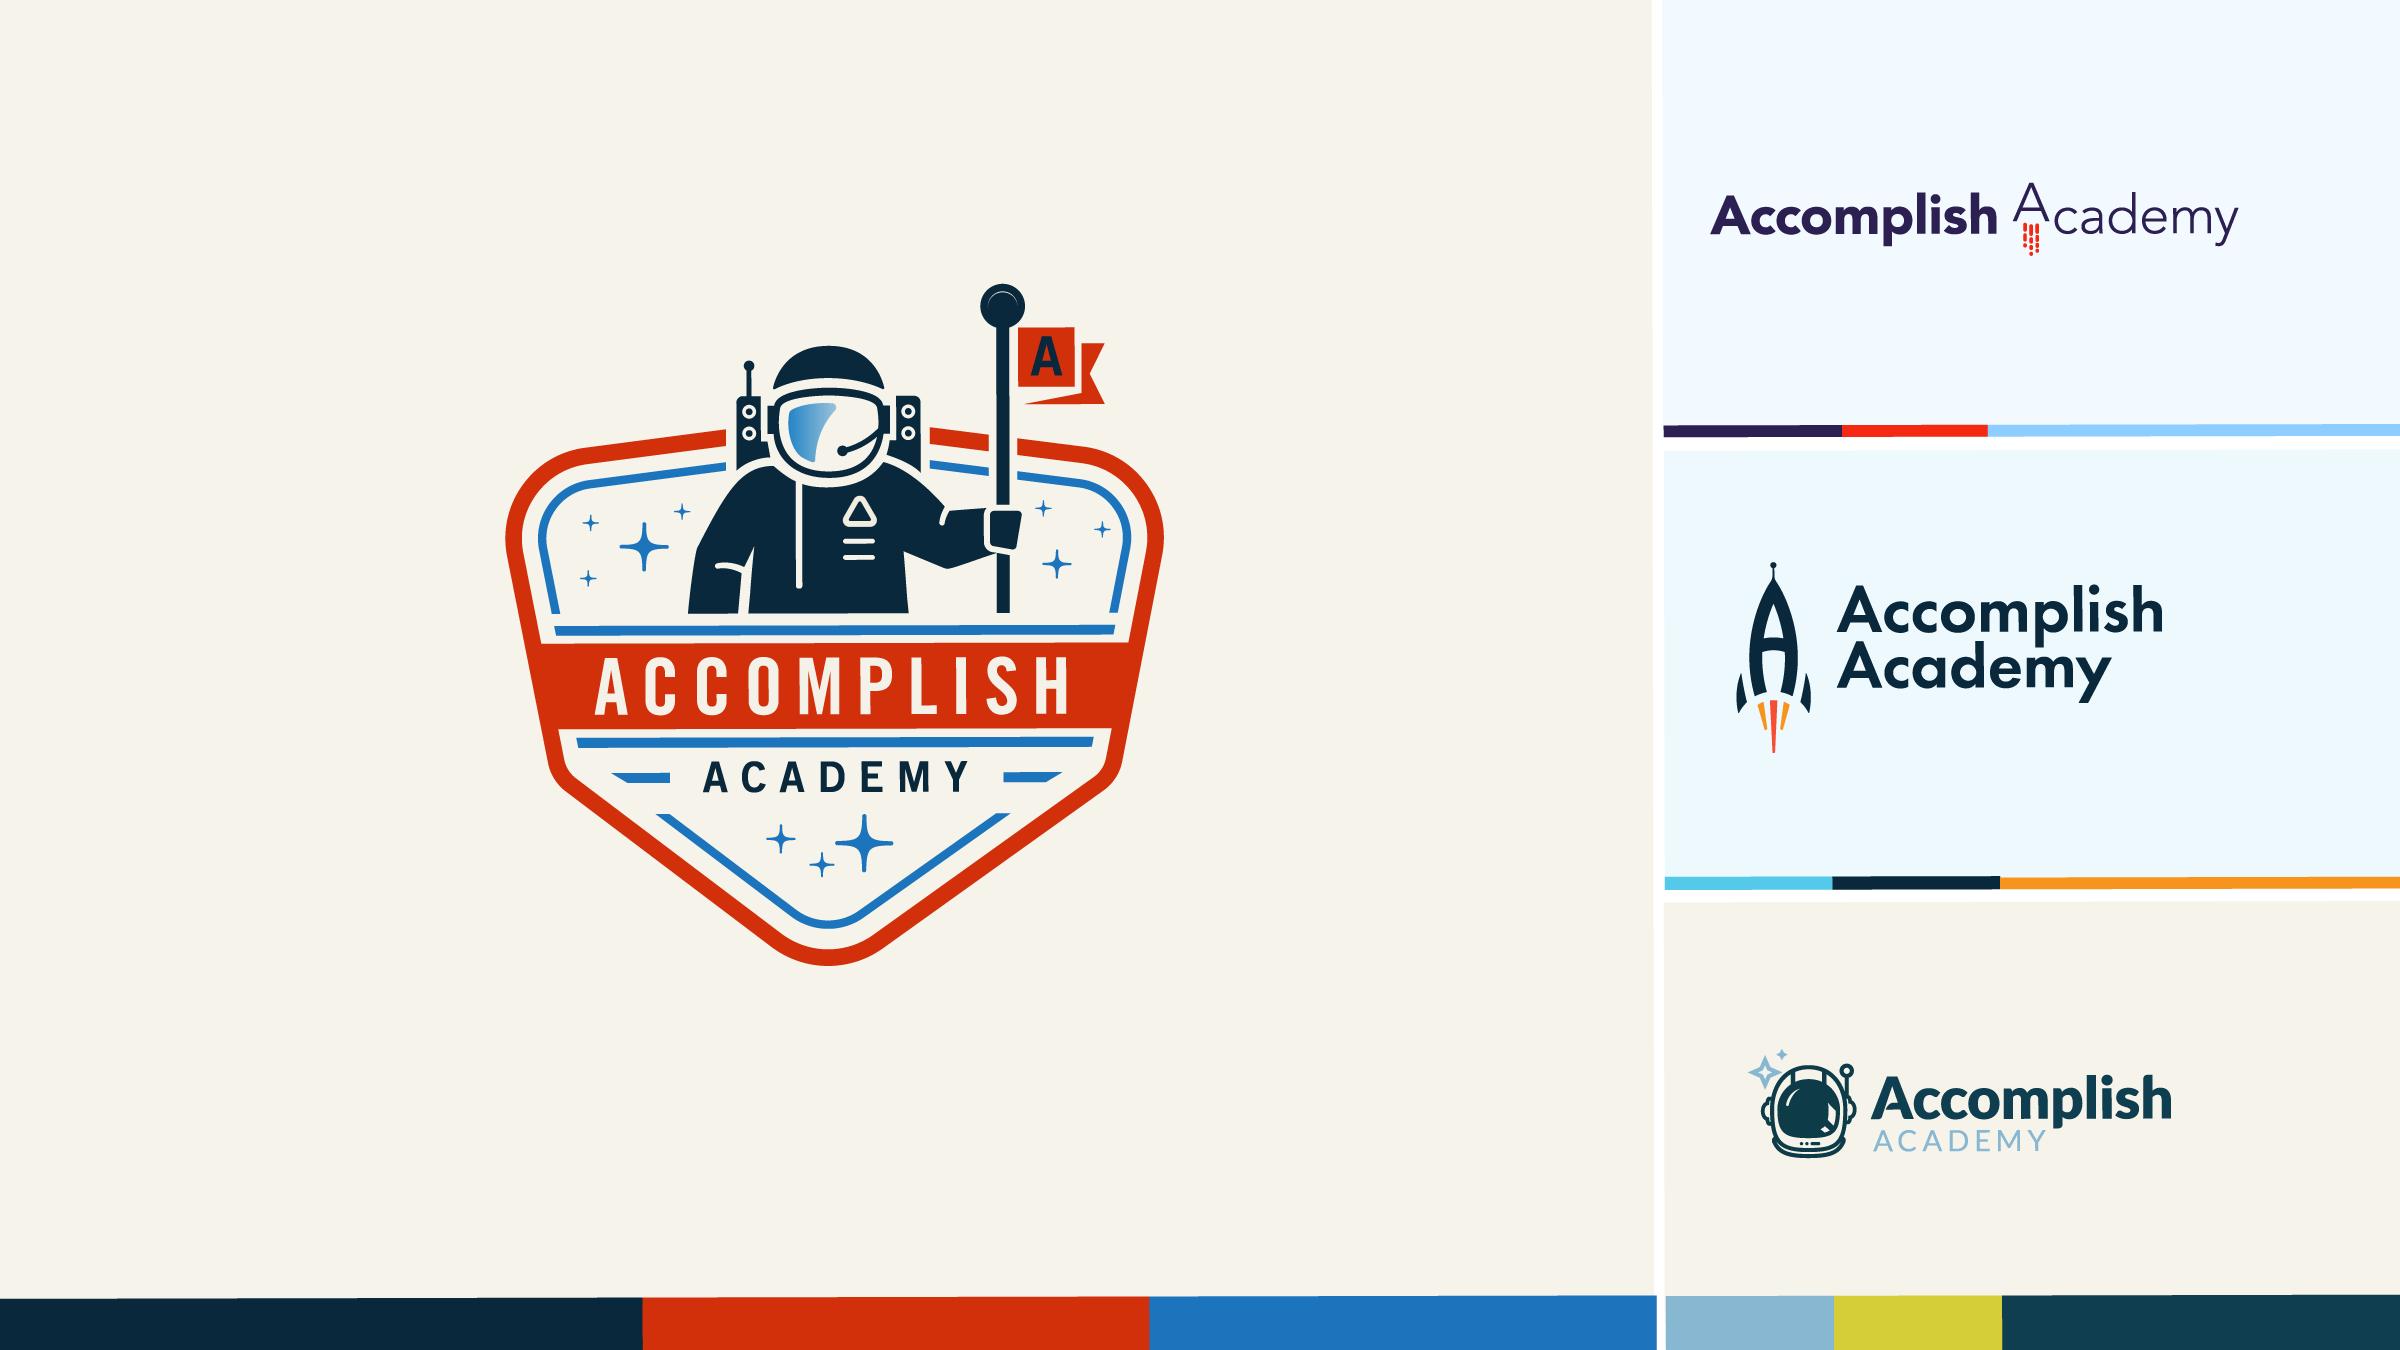 accomplish-academy